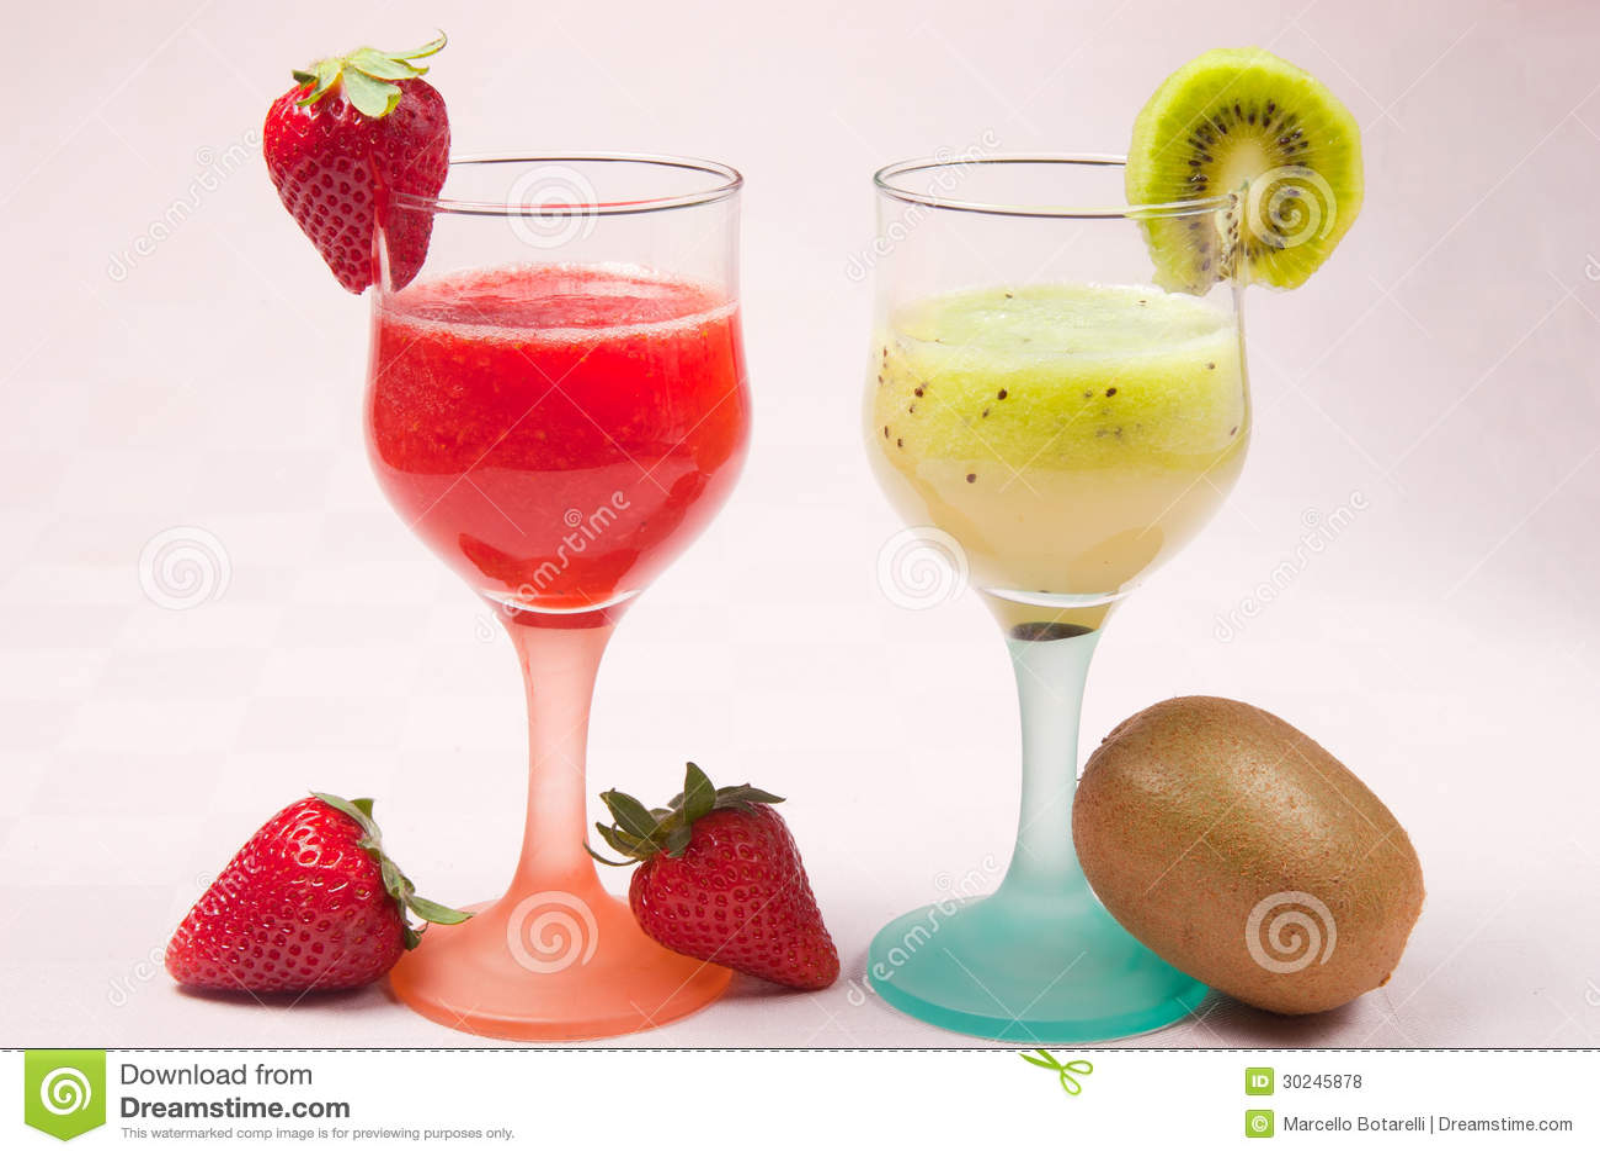 how to make kiwi juice from fresh kiwi